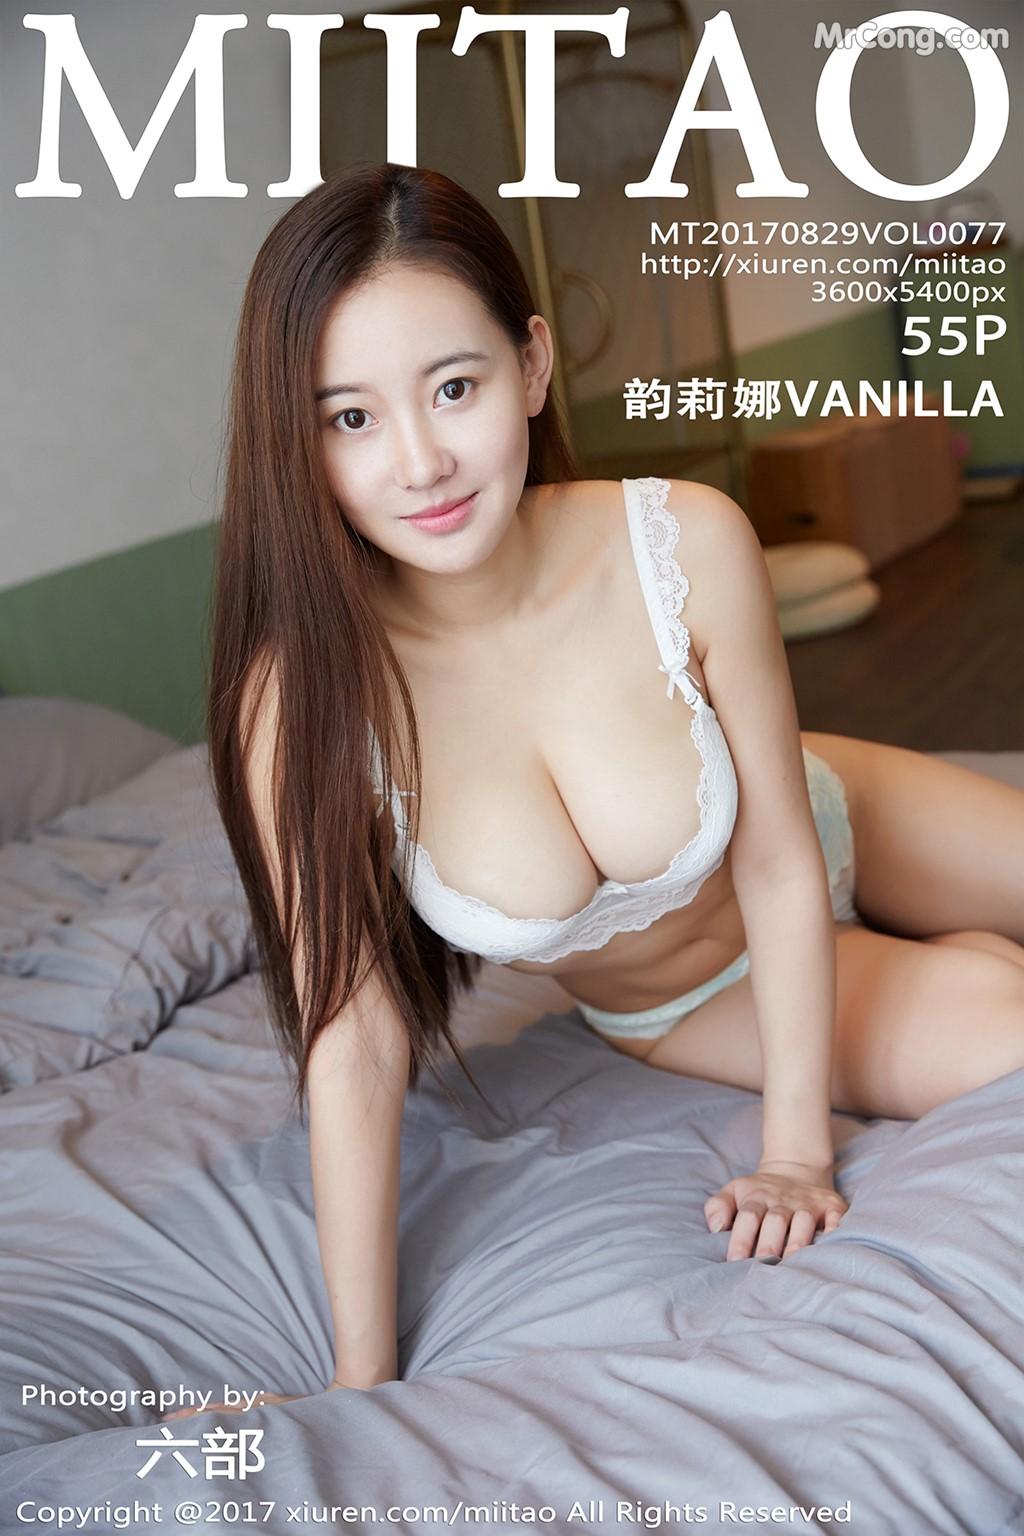 Image MiiTao-Vol.077-Yun-Li-Na-VANILLA-MrCong.com-056 in post MiiTao Vol.077: Người mẫu Yun Li Na (韵莉娜VANILLA) (56 ảnh)